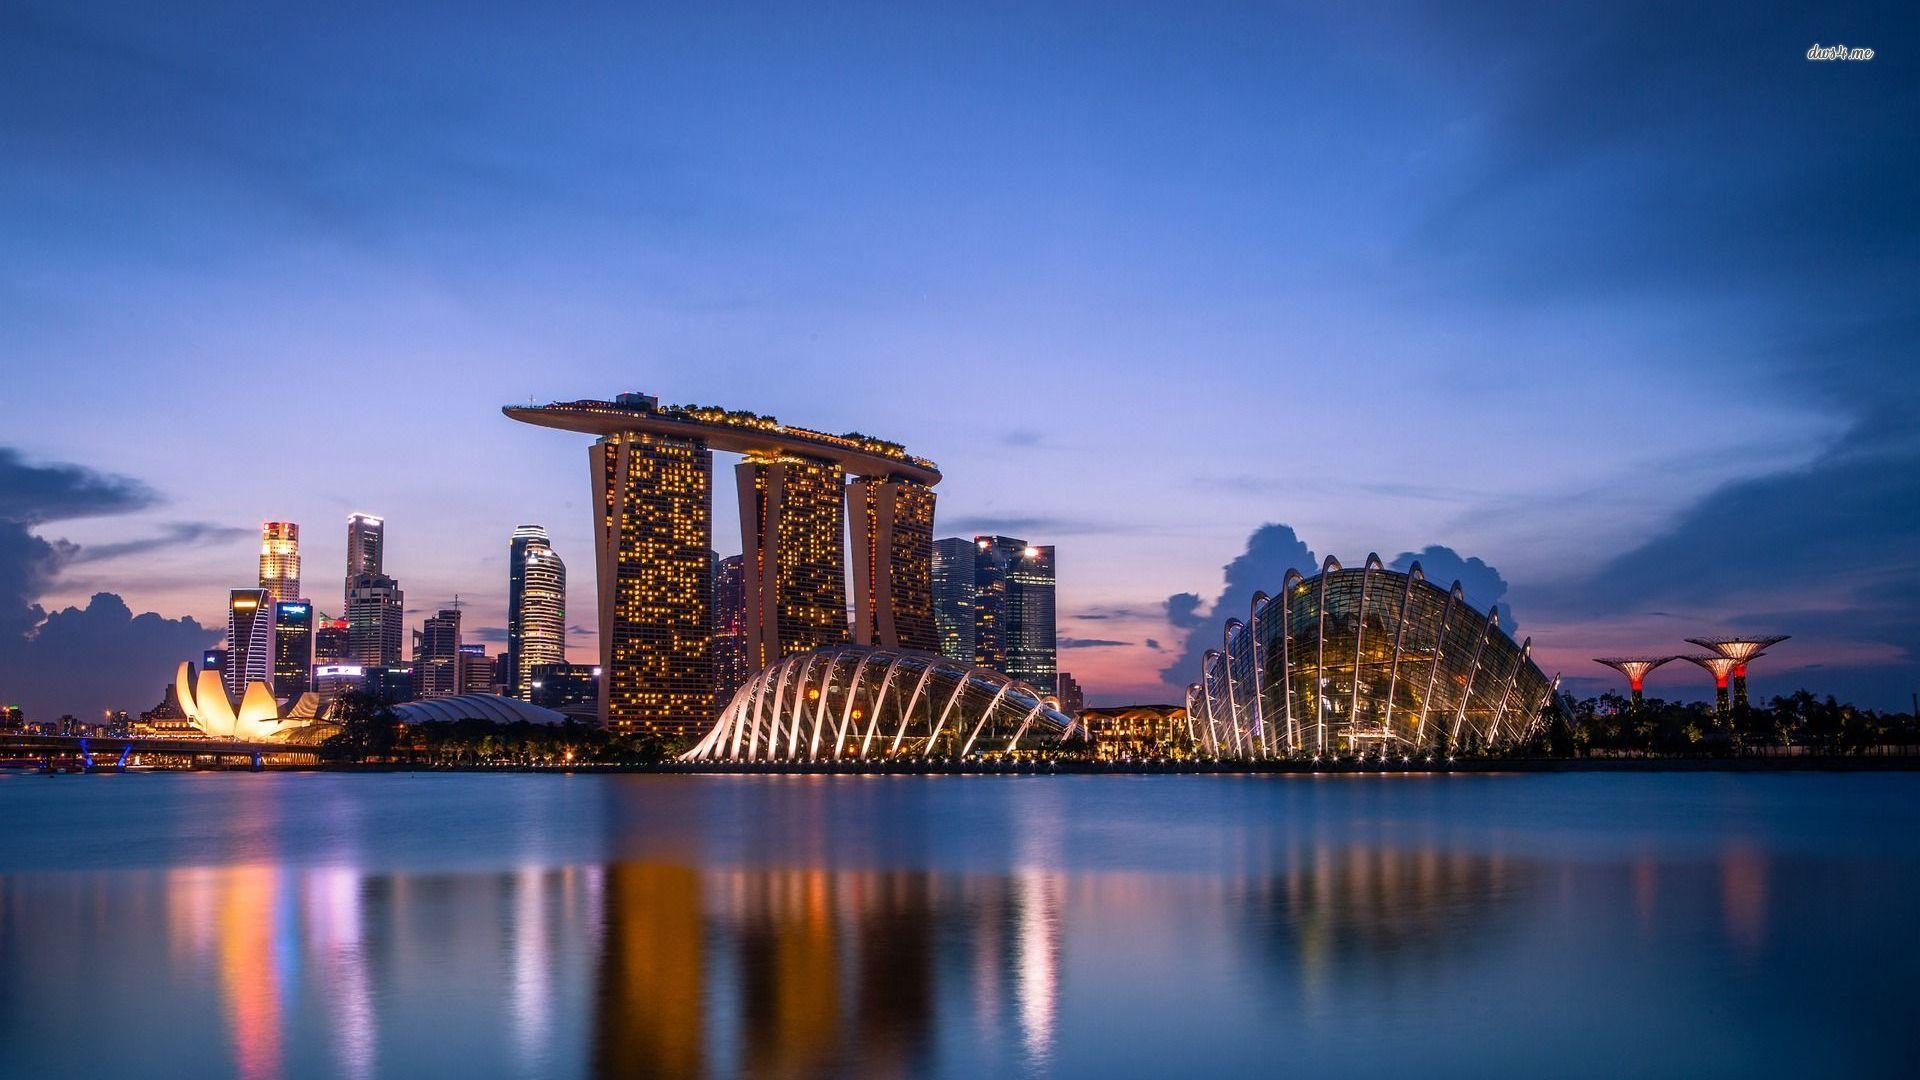 Of The City Of Singapore Wallpapers Hd Hd Desktop 1920x1080 Download Hd Wallpaper Wallpapertip